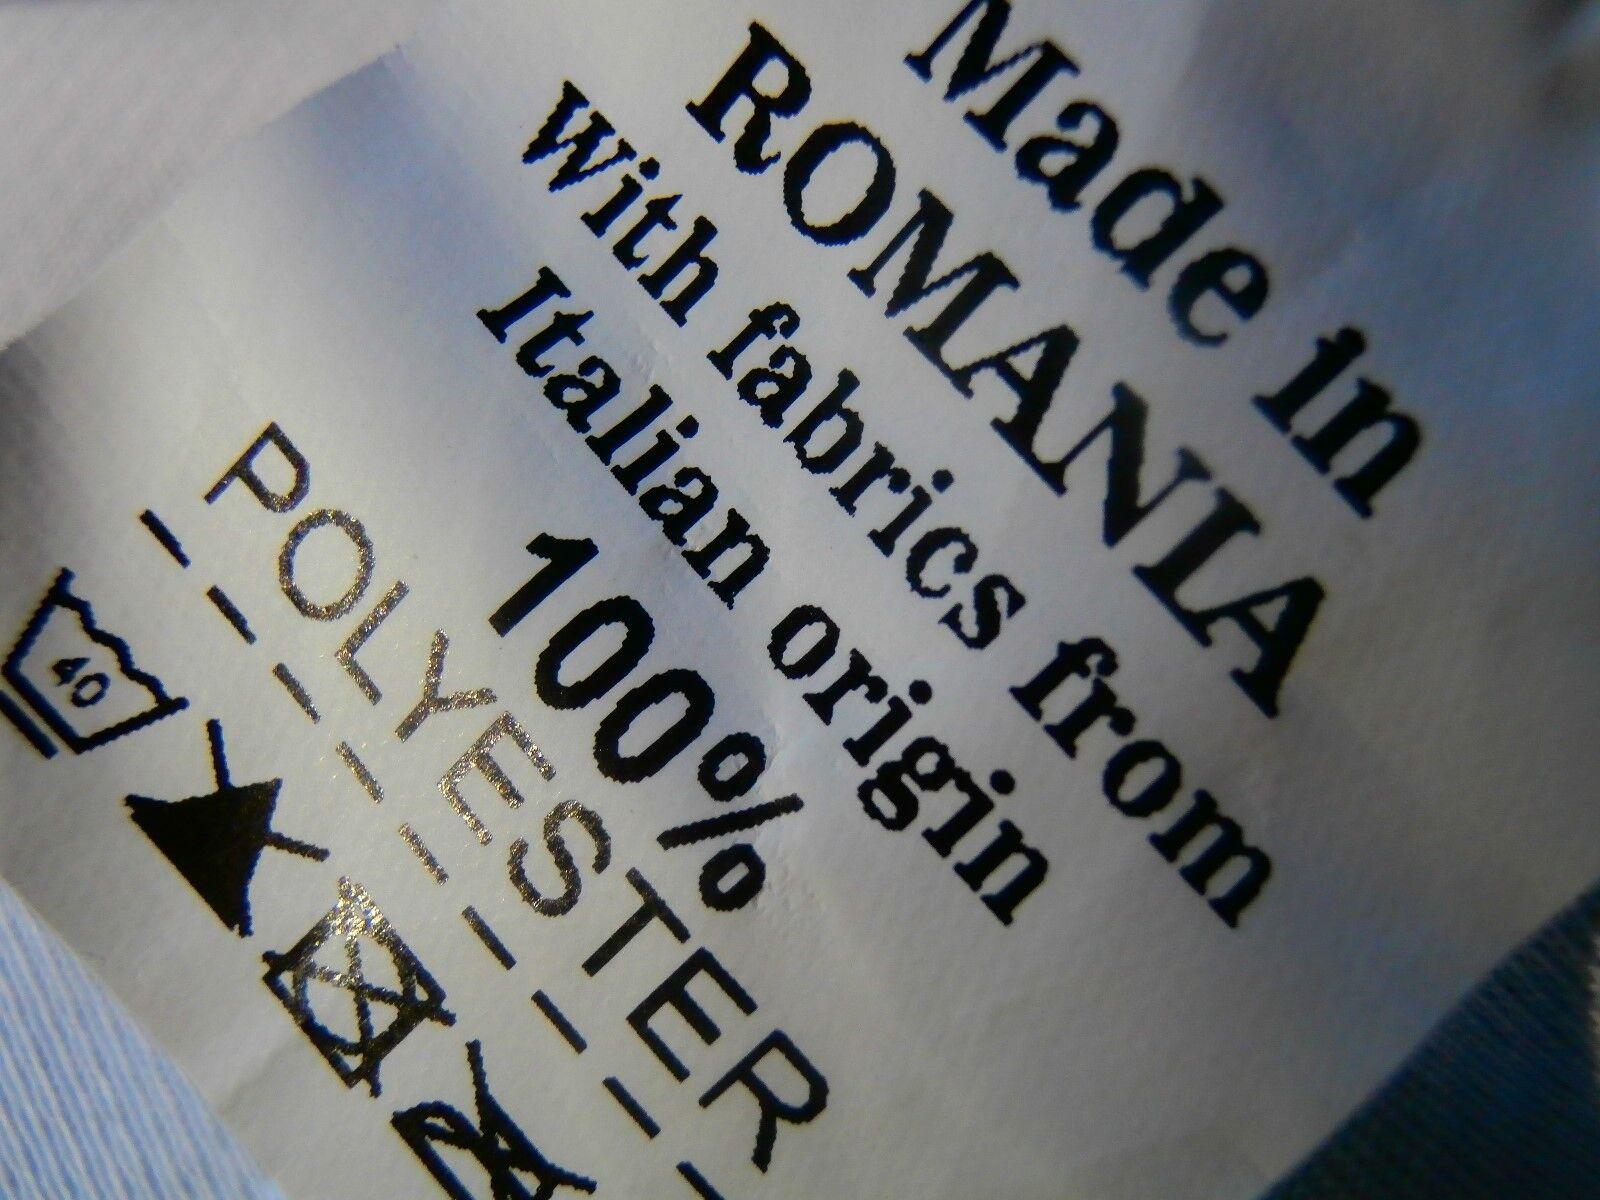 Zoot 2012 Kona Kona Kona Hawaii Triatlón Ironman campeonato del mundo para Ciclismo Jersey Talla M 43c550